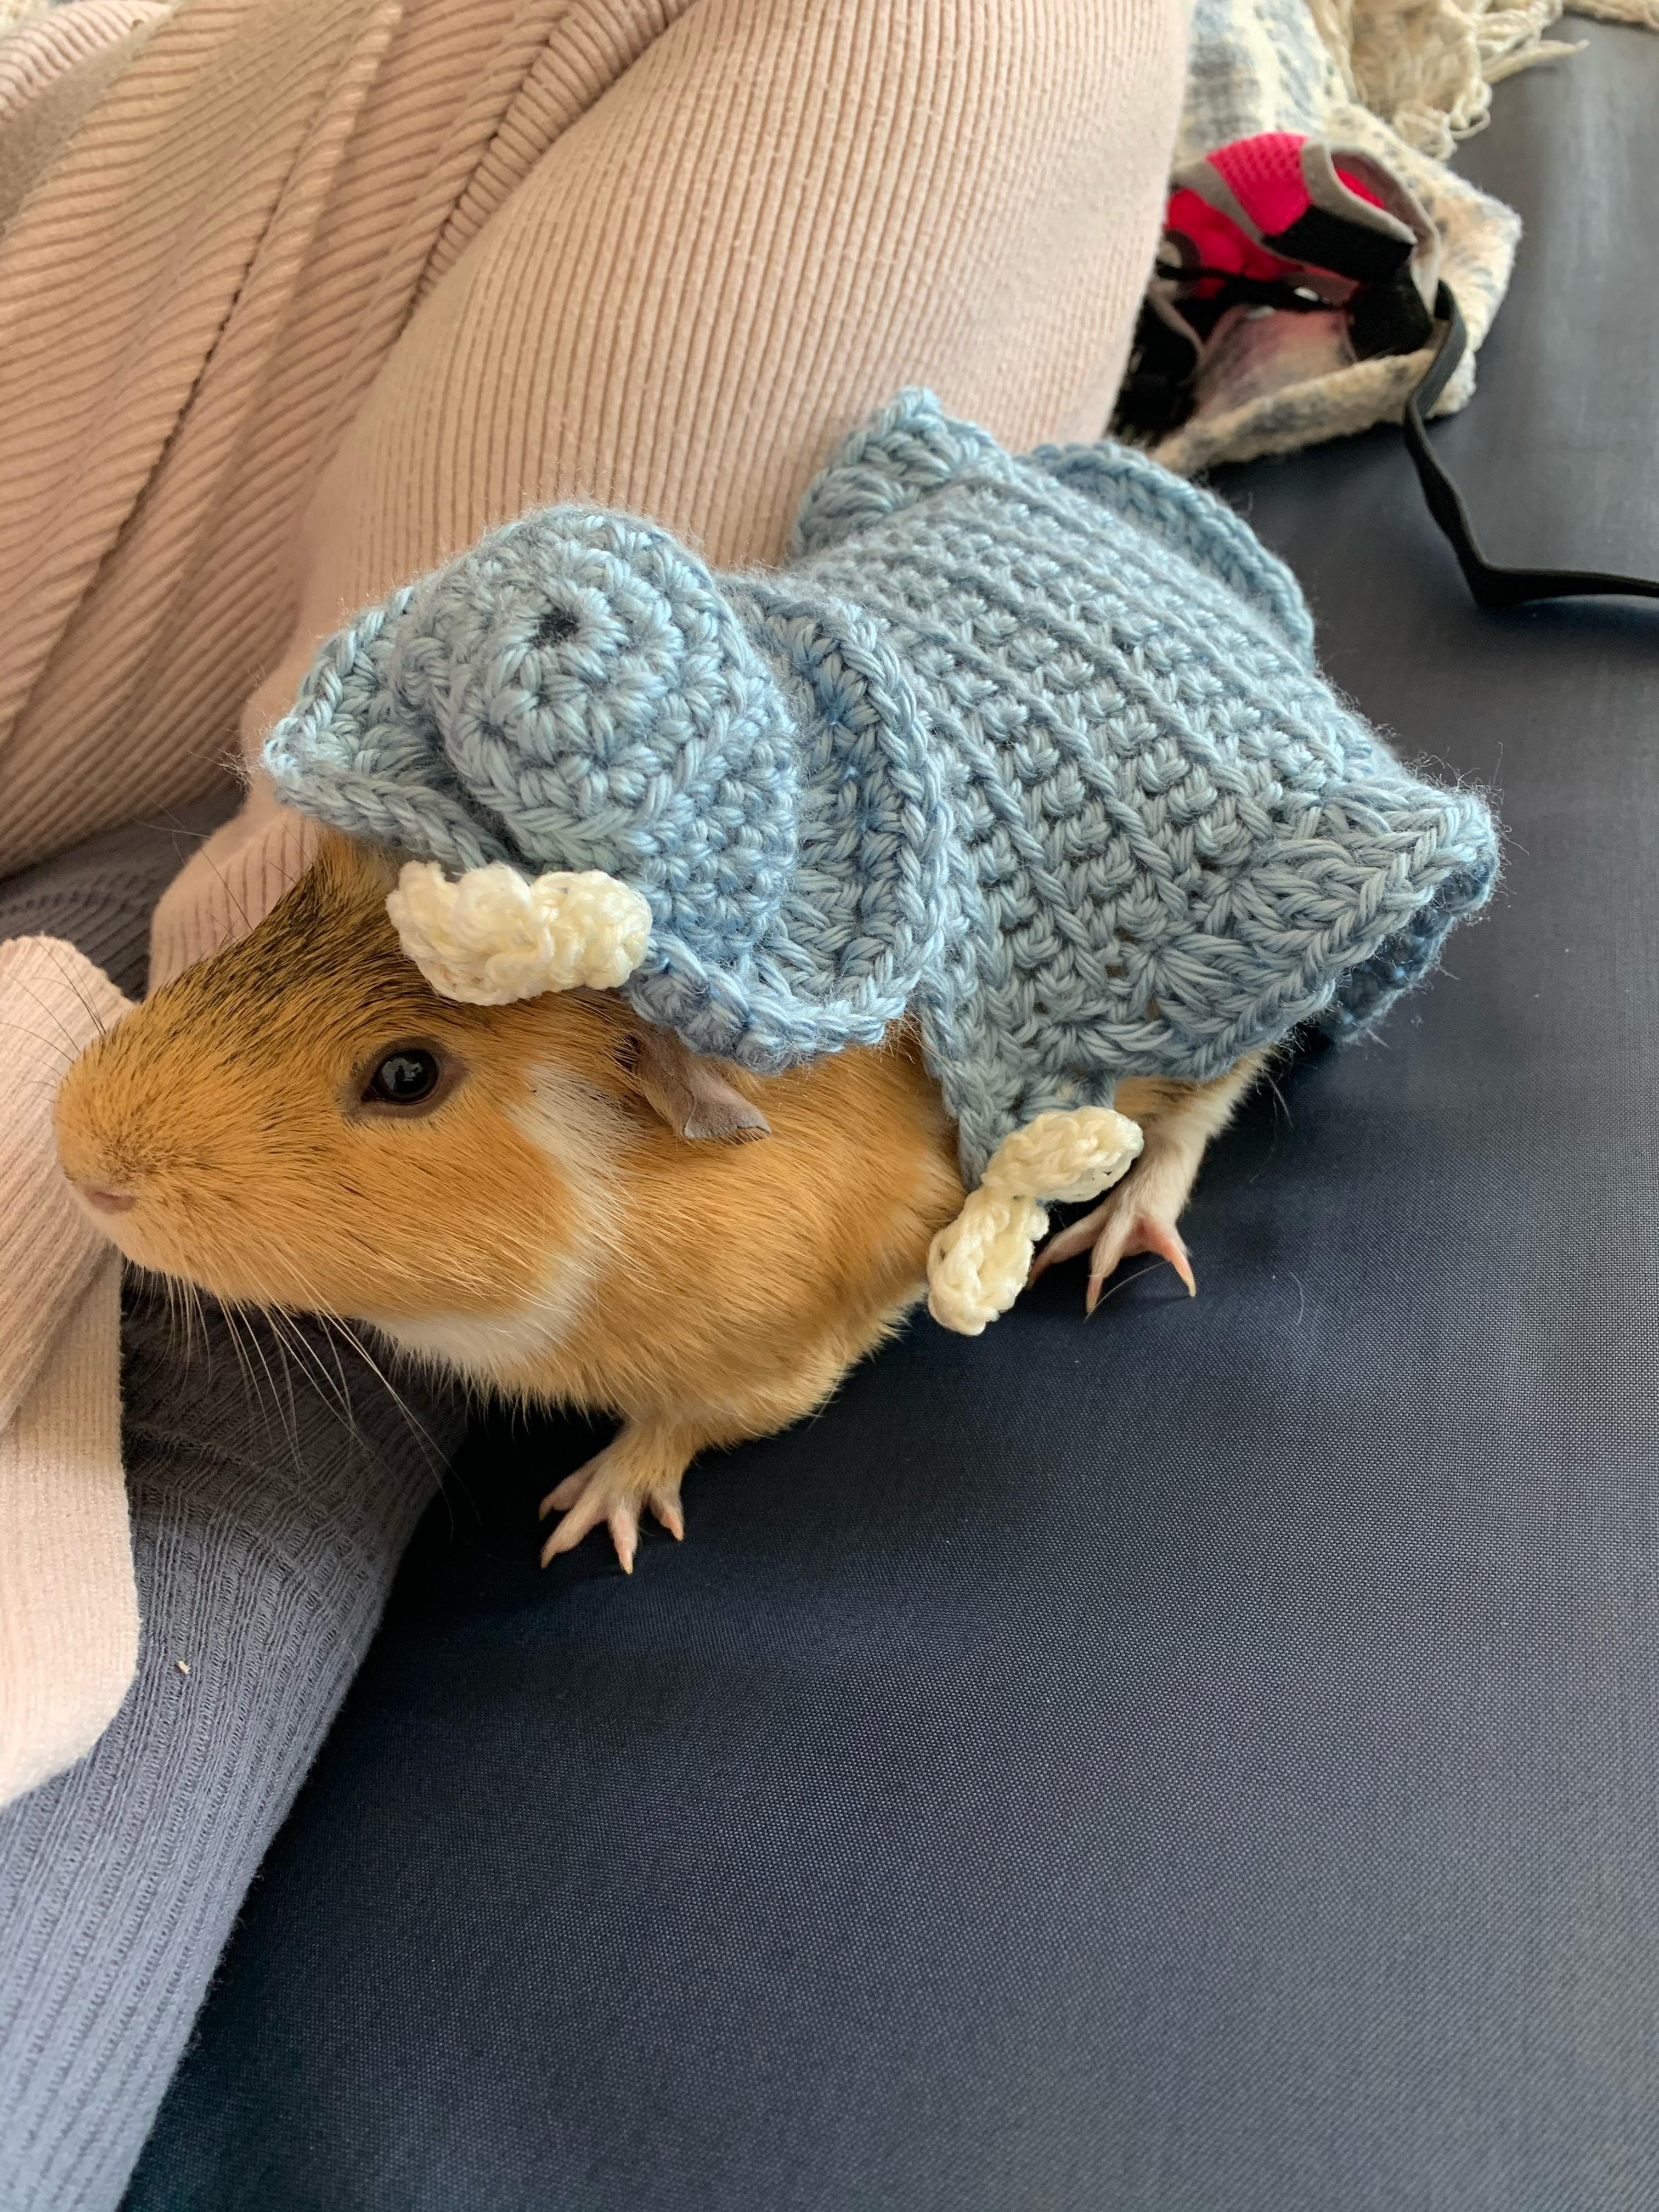 Freddie, one of SU senior Anna Gulizio's guinea pigs, styles homemade knitted clothing.